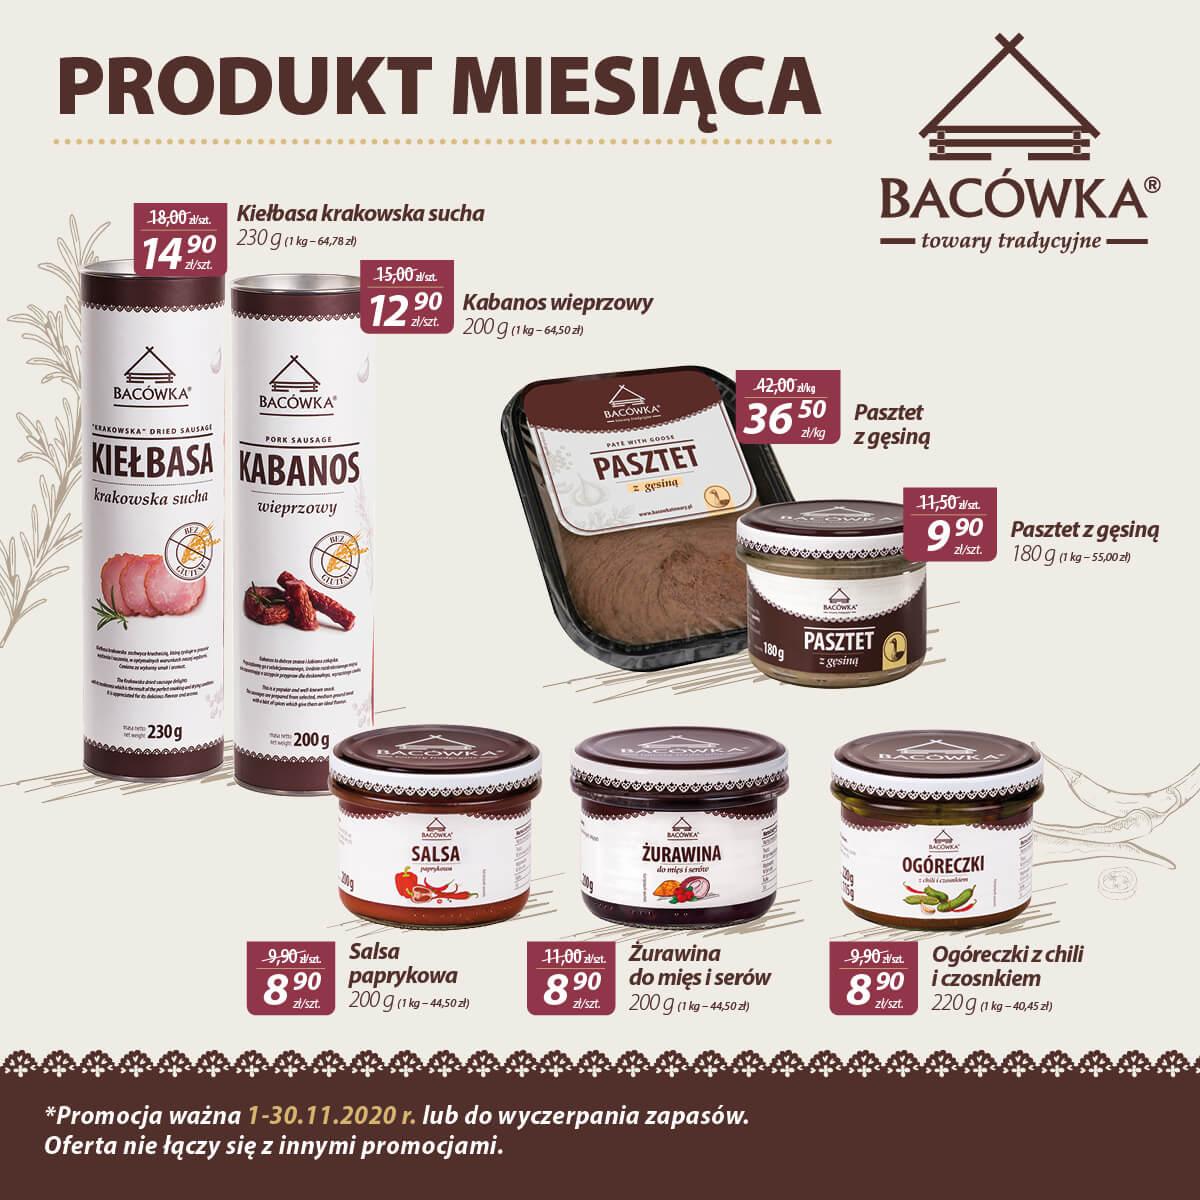 BACOWKA_1200x1200_web_listopad